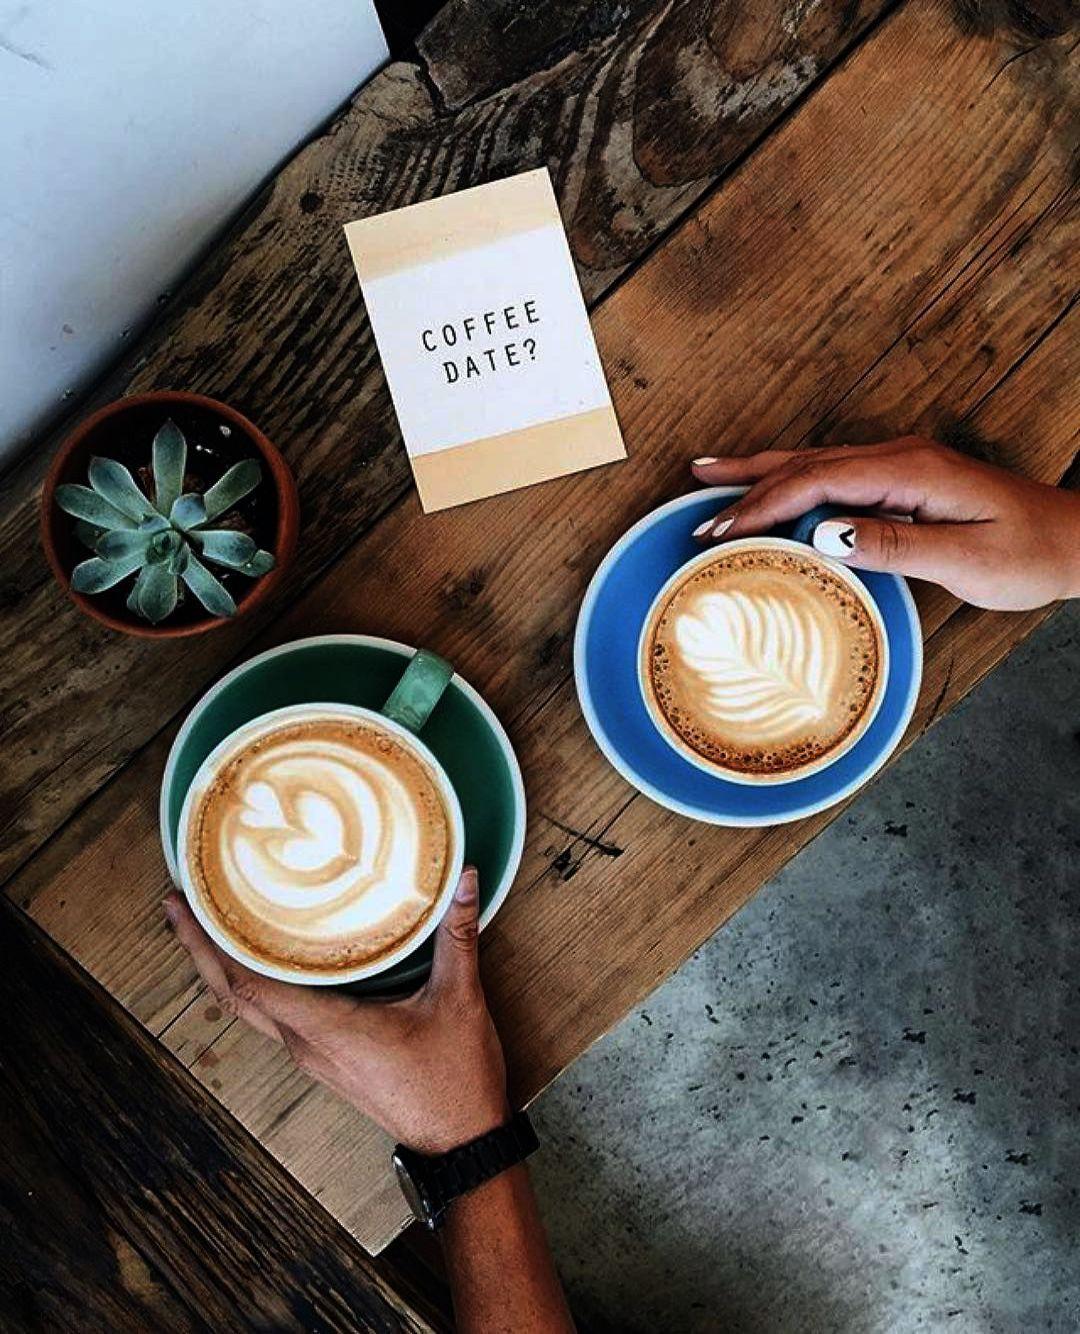 Coffee Cake But Coffee Shops Near Me Greenville Sc Next Coffee Bean Ontario Soon Coffee Chocolate Duster Below Coffee Meets Coffee Date Coffee Cafe Coffee Love